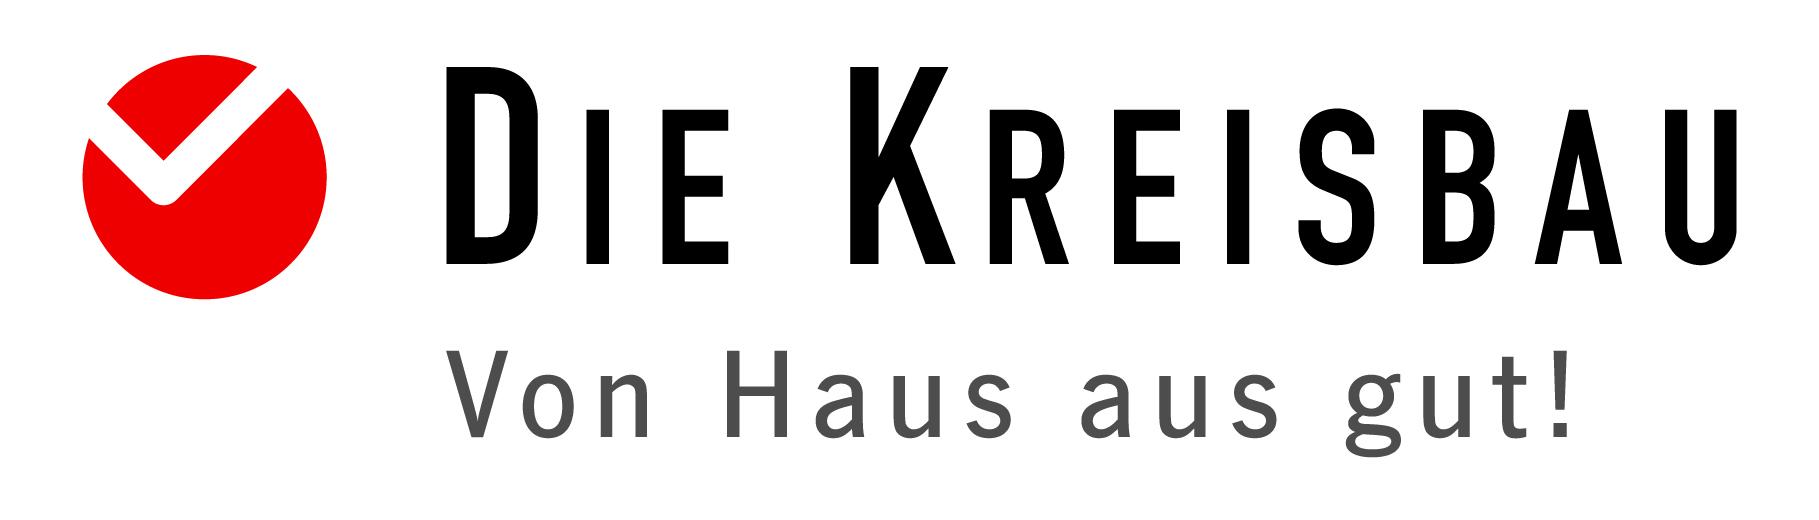 kreisbau-logo_4c